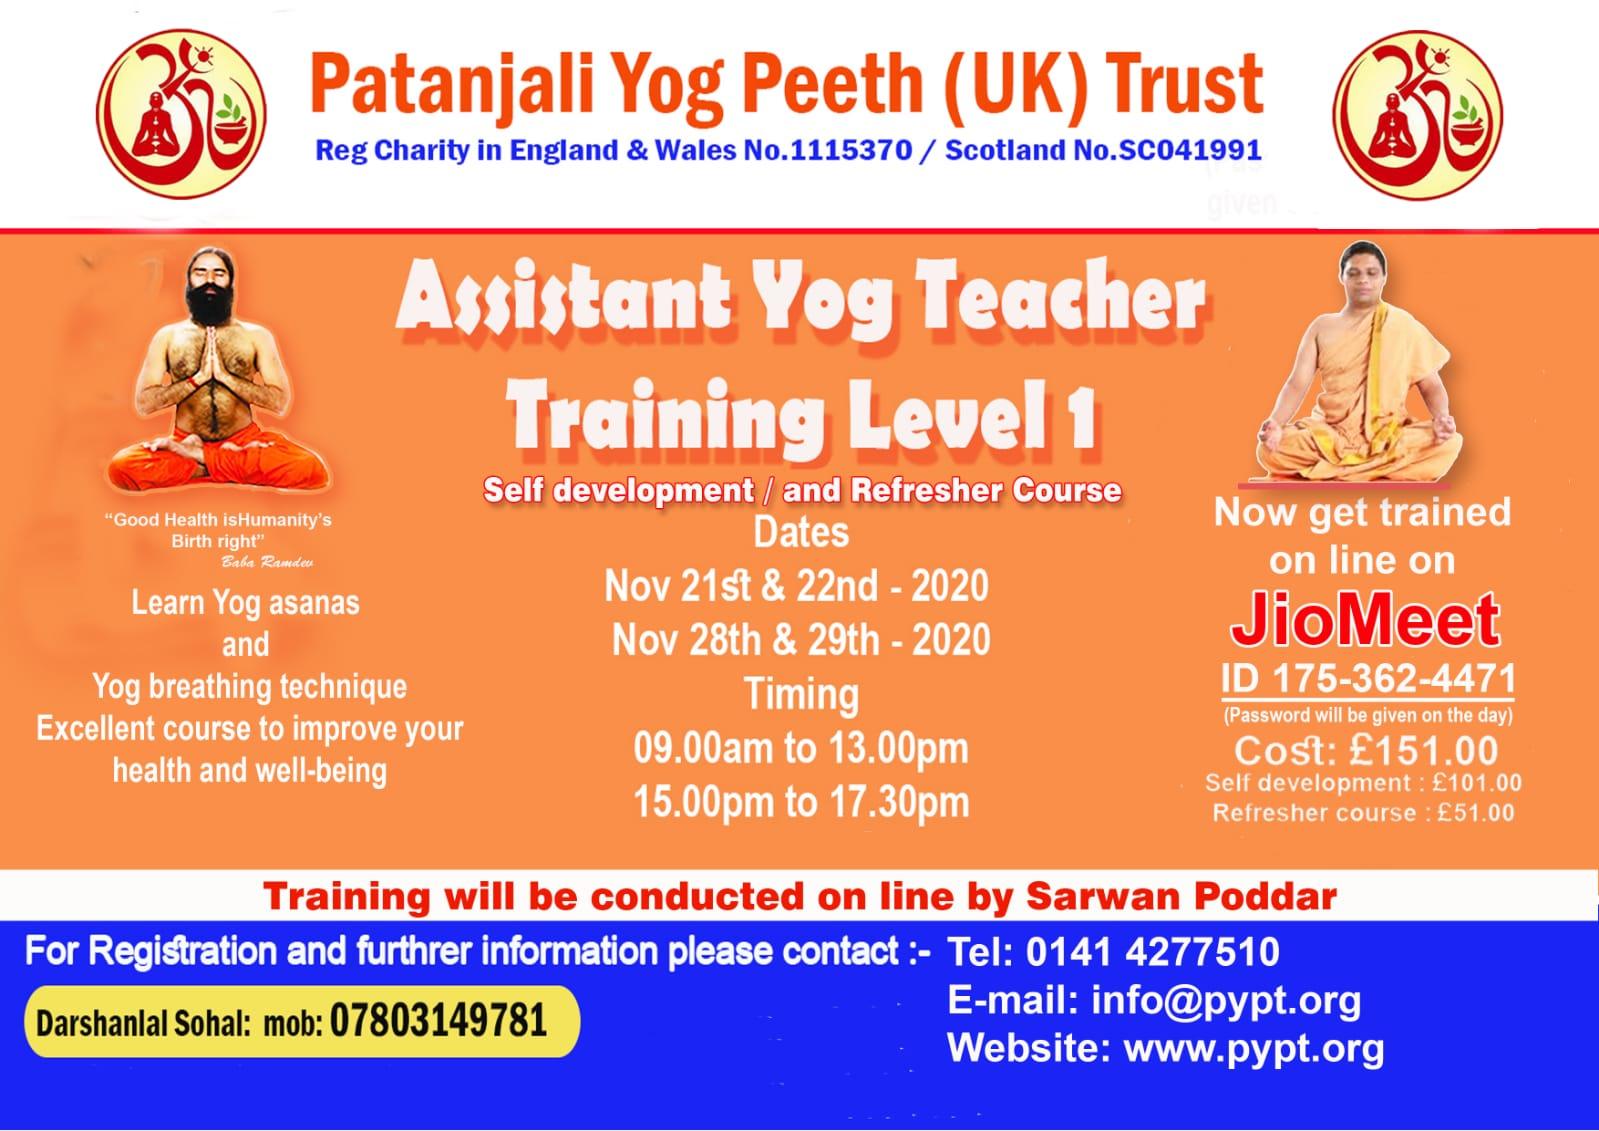 AYT training online November 2020